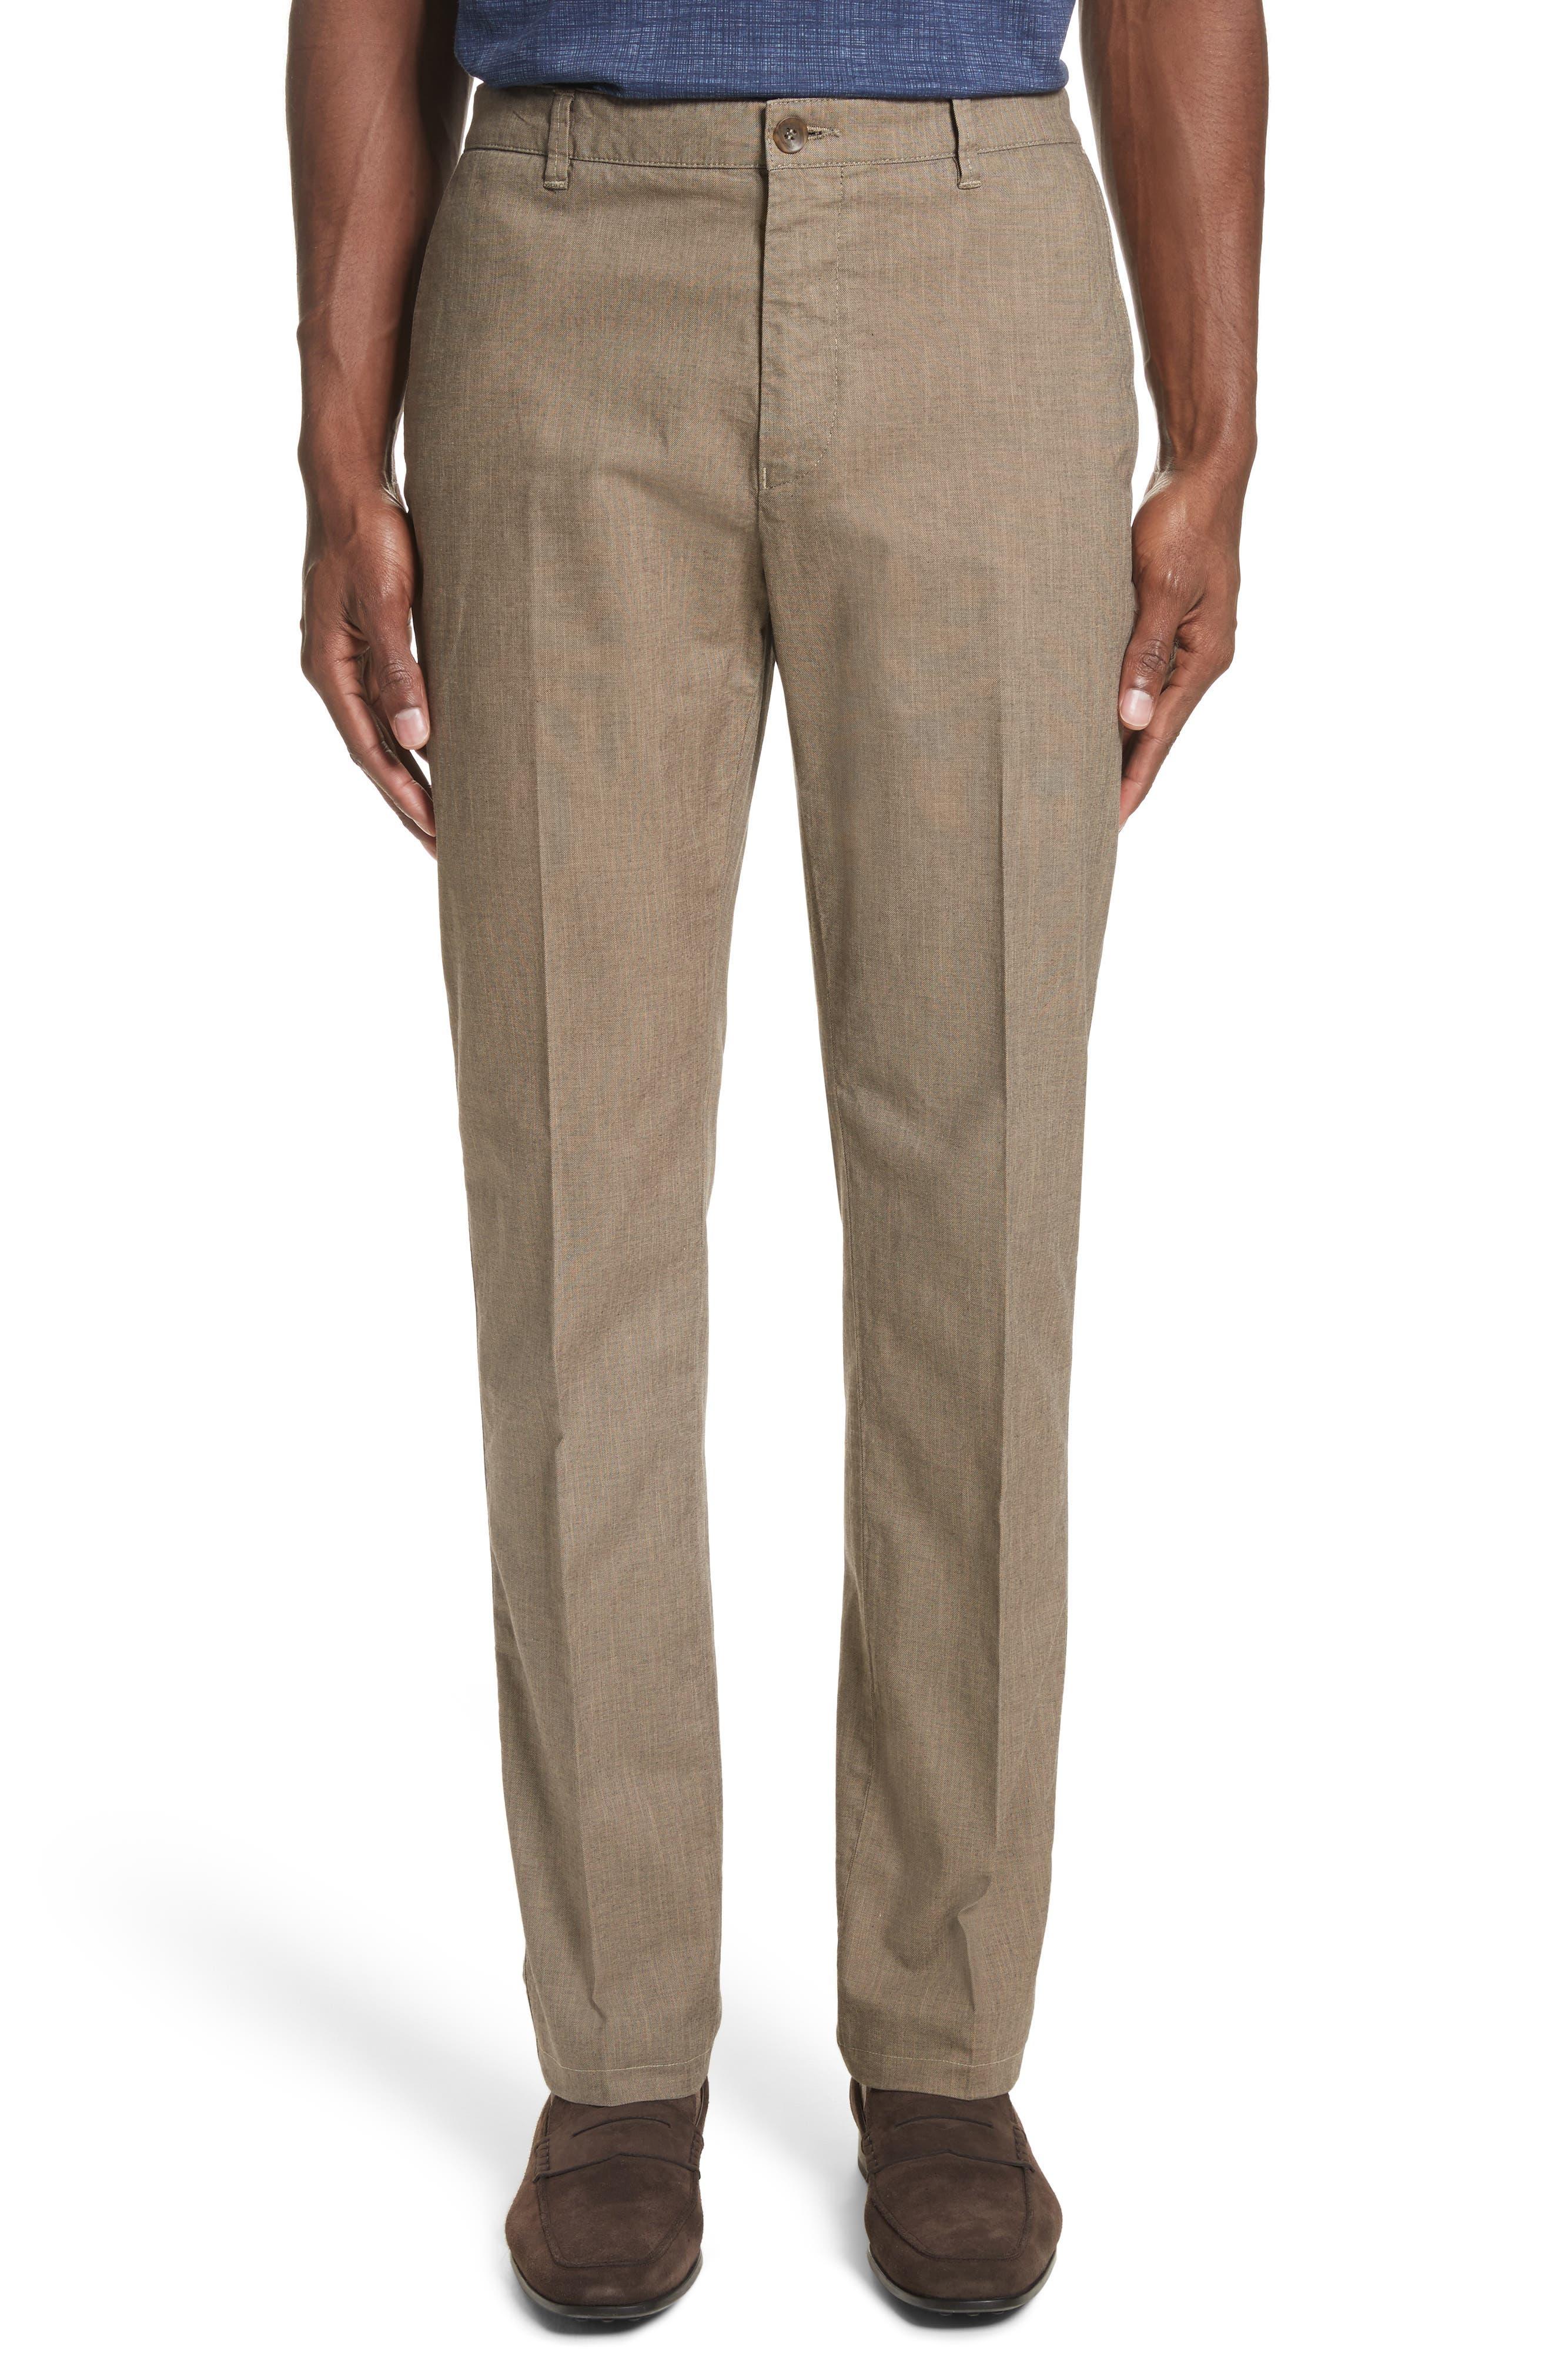 French Pocket Stretch Straight Leg Pants,                             Main thumbnail 1, color,                             Dark Beige